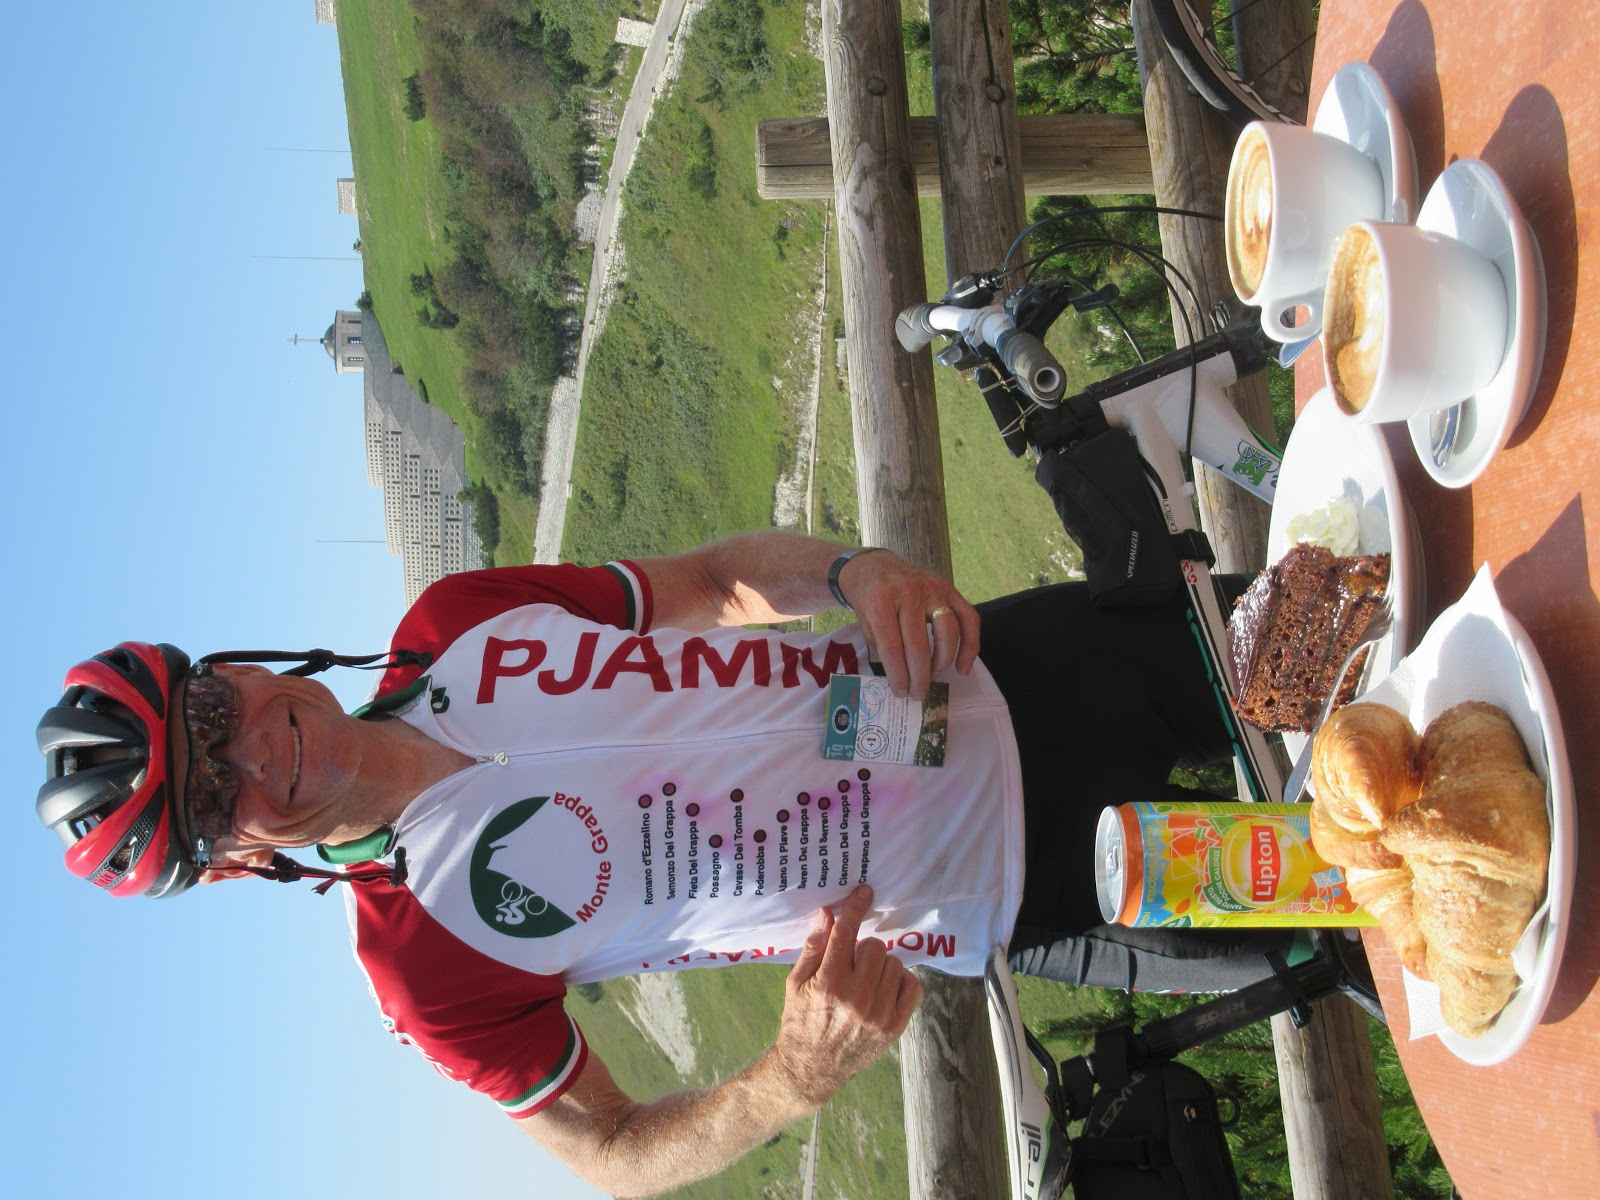 Cycling Monte Grappa from Crespano - John Johnson PJAMM Cycling - 11 Monte Grappa climbs in 6 days